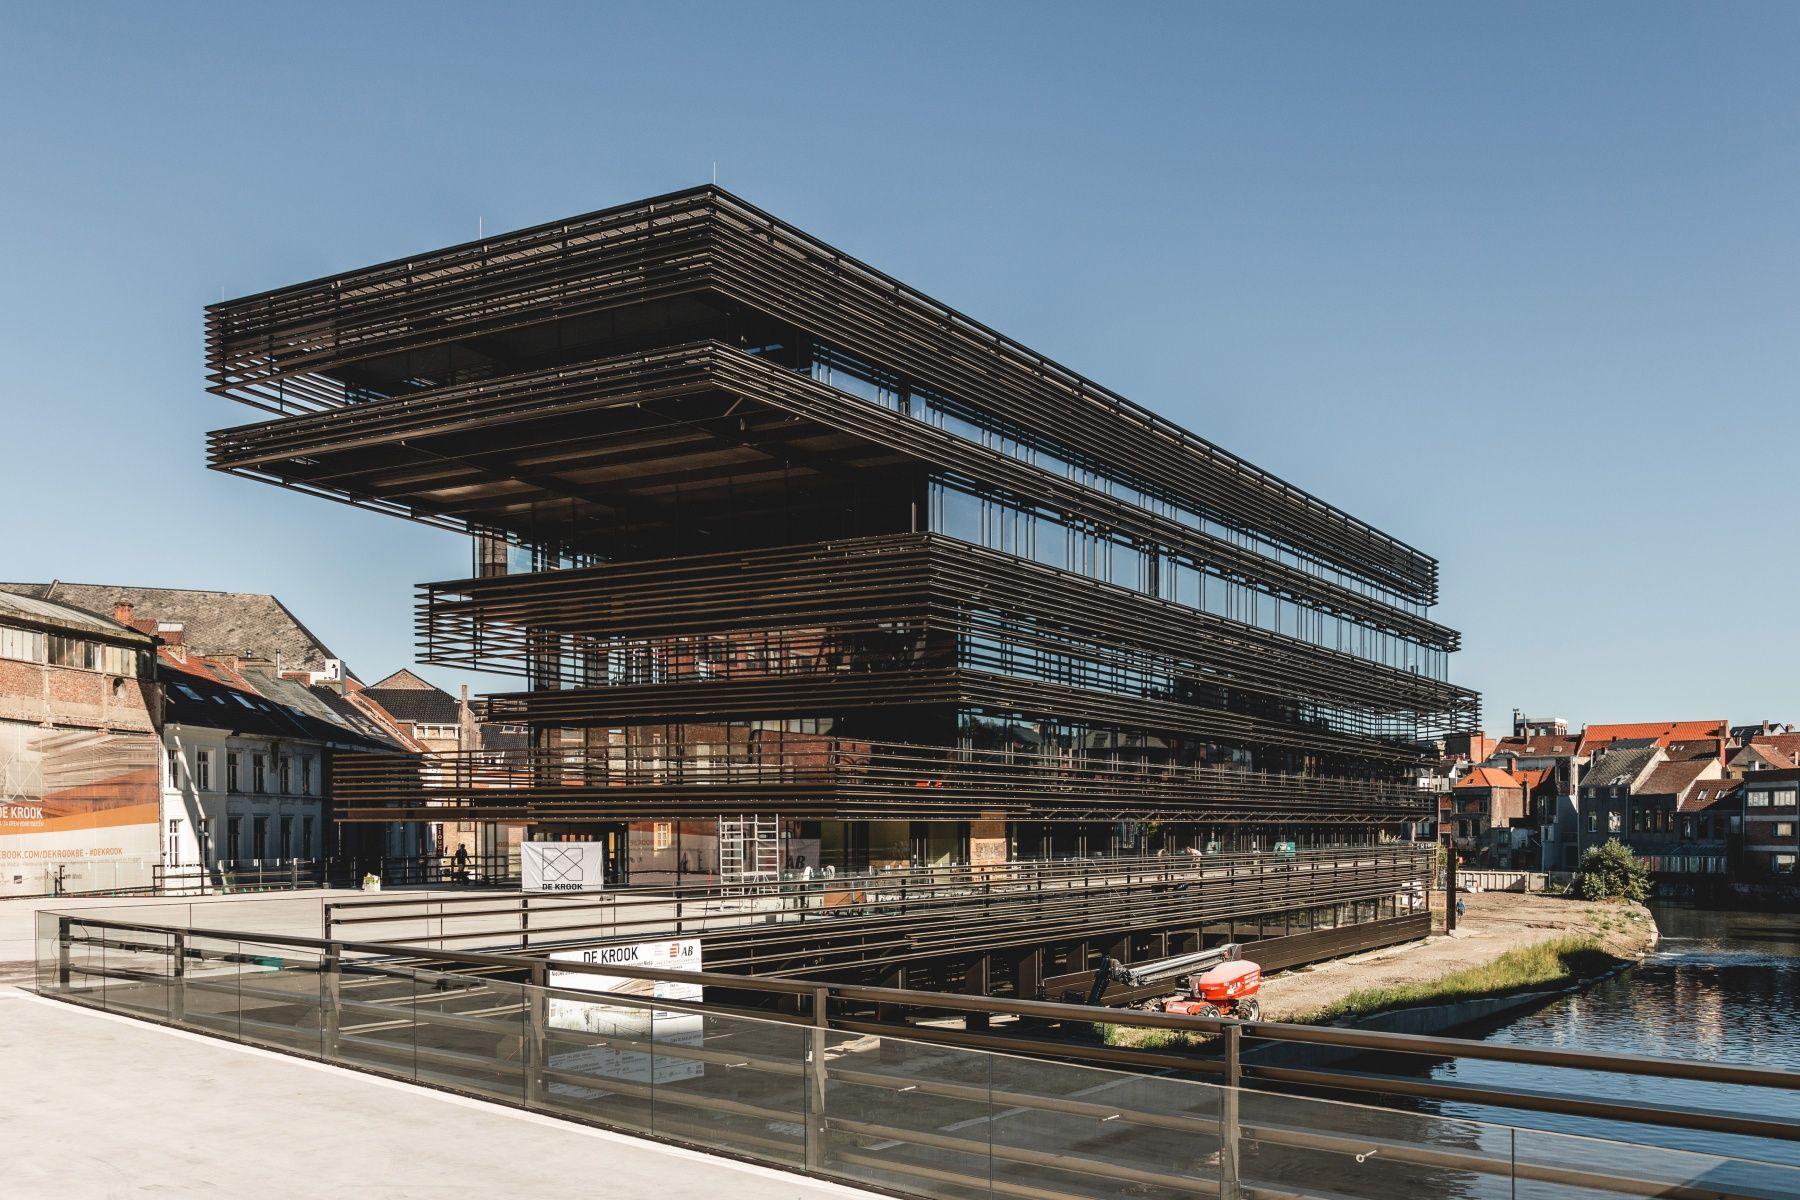 De Krook The Modern Library Moderne Bibliotheek Architectuur Gent